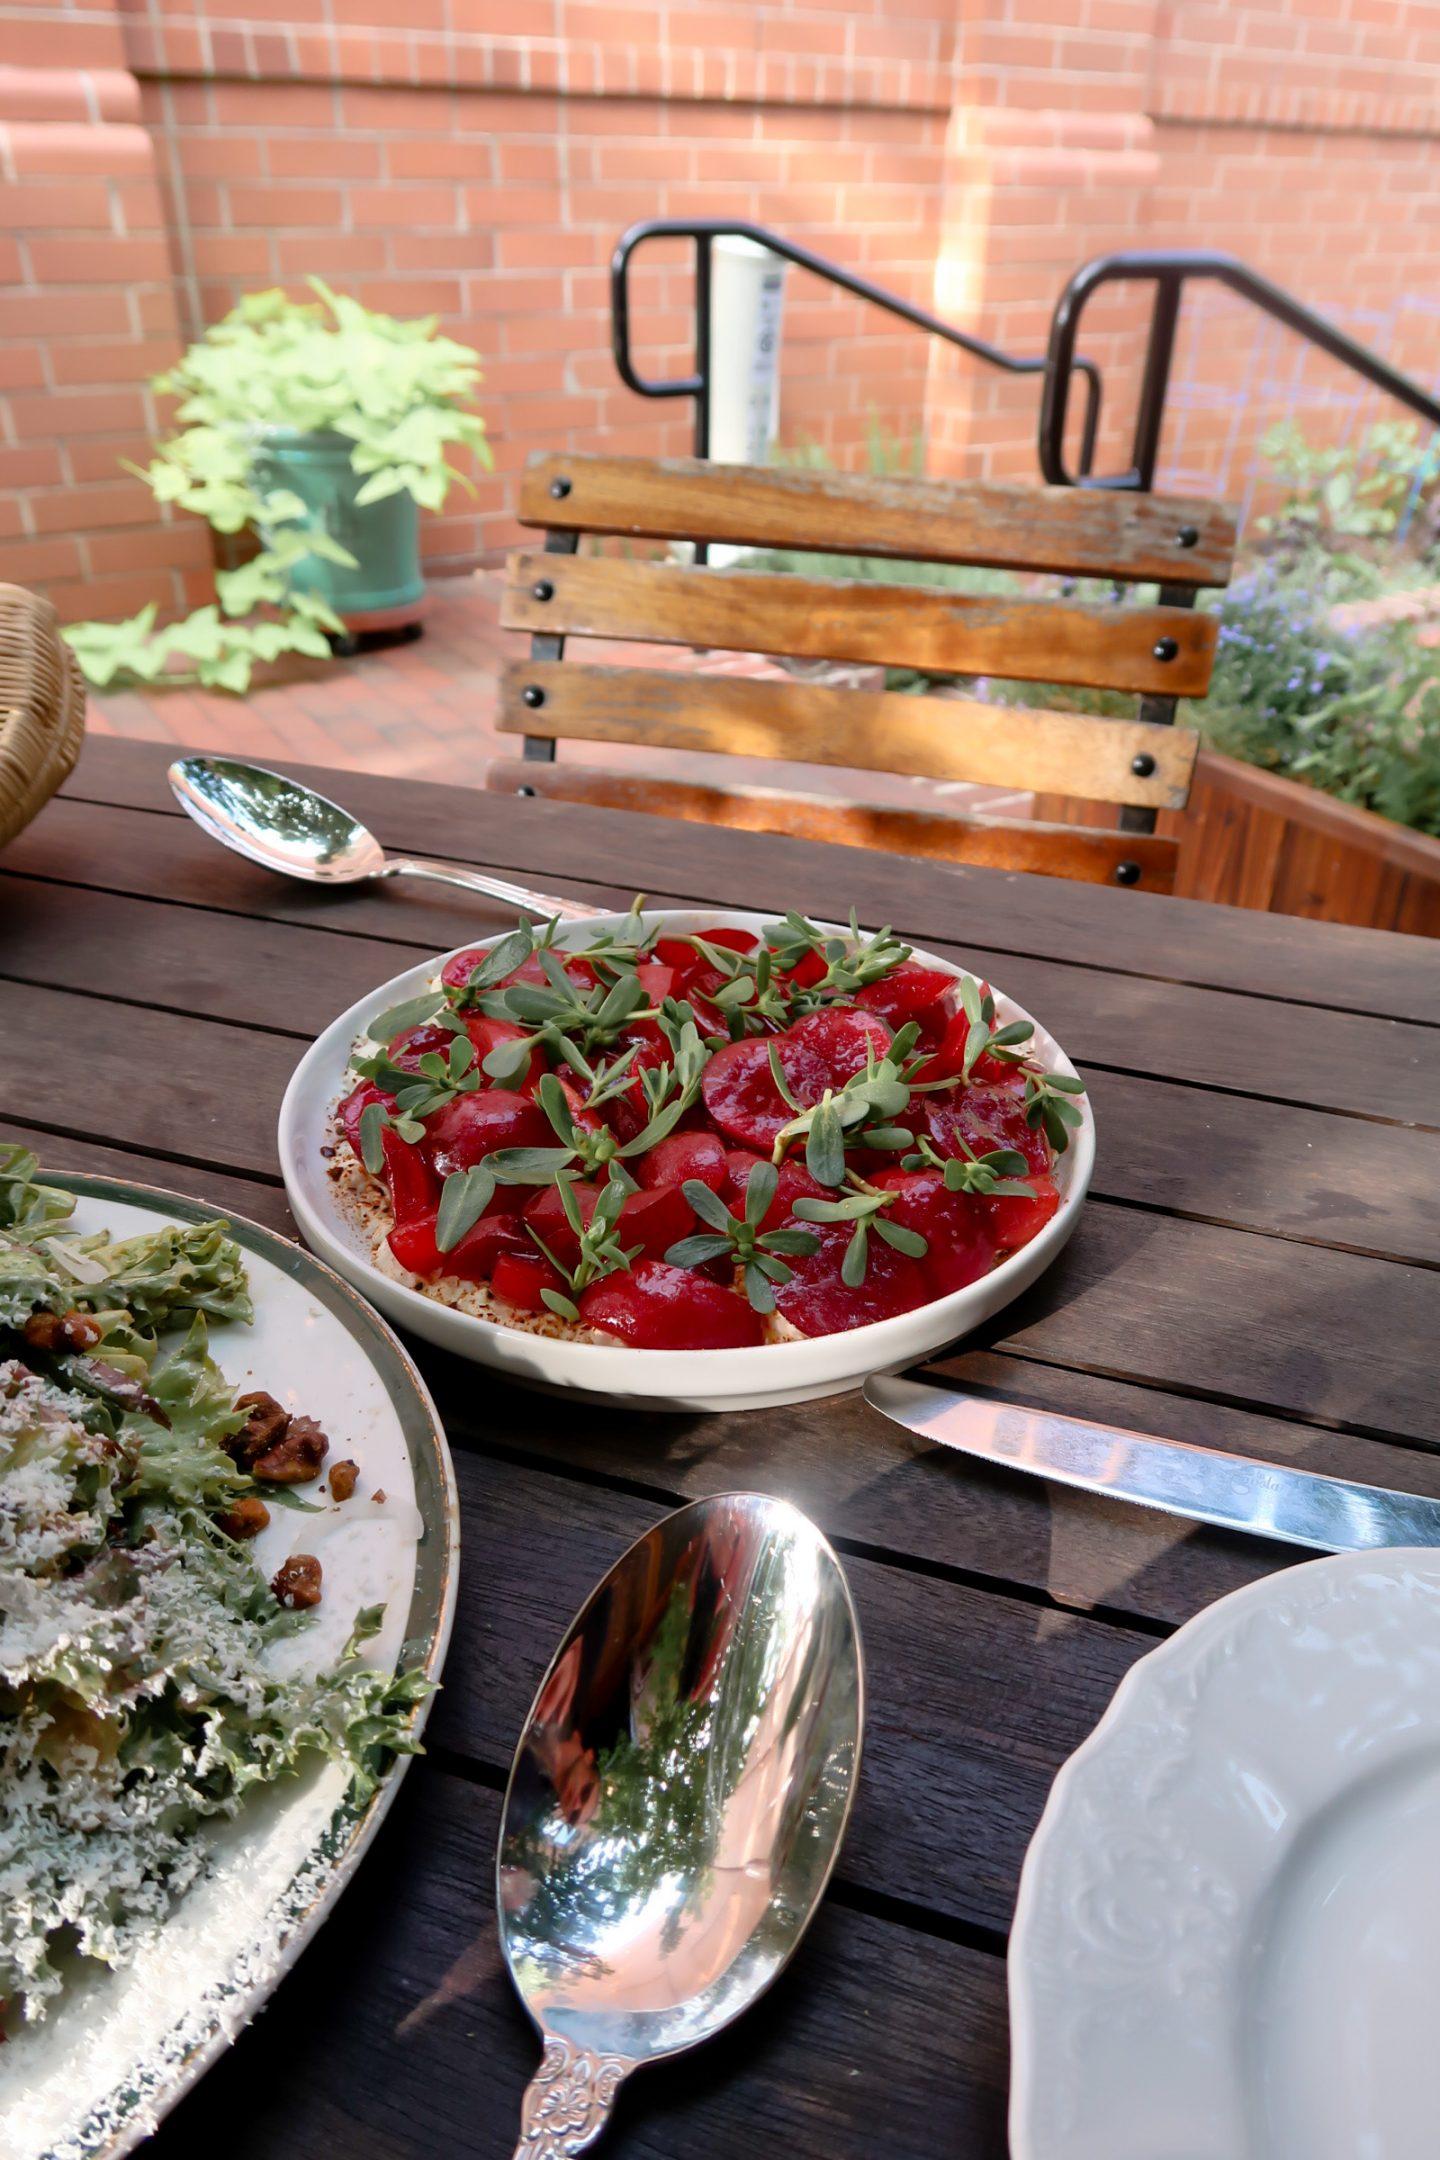 Kindred Restaurant - Davidson, NC - Charlotte Lifestyle Blog